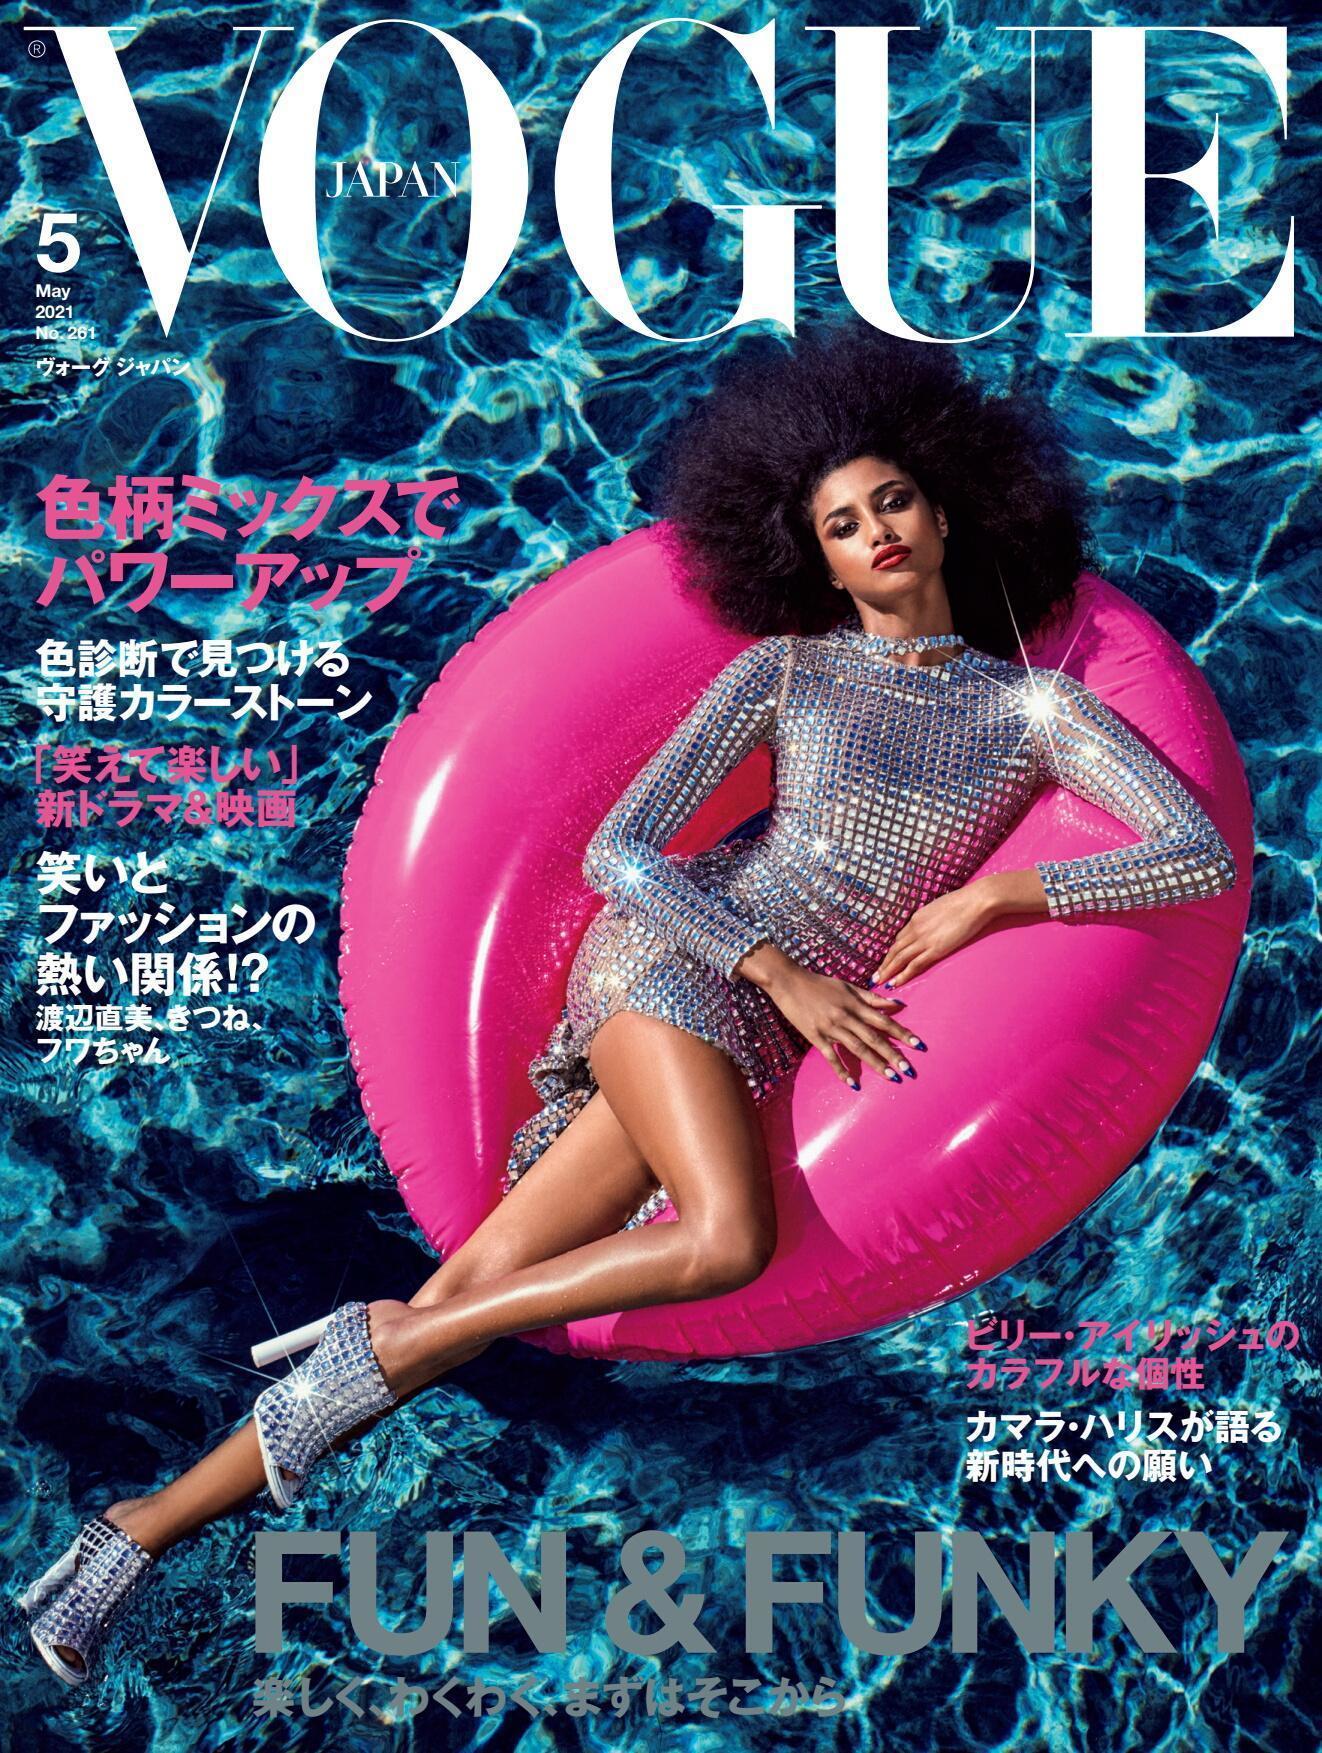 VOGUE JAPAN Special – 5月 2021